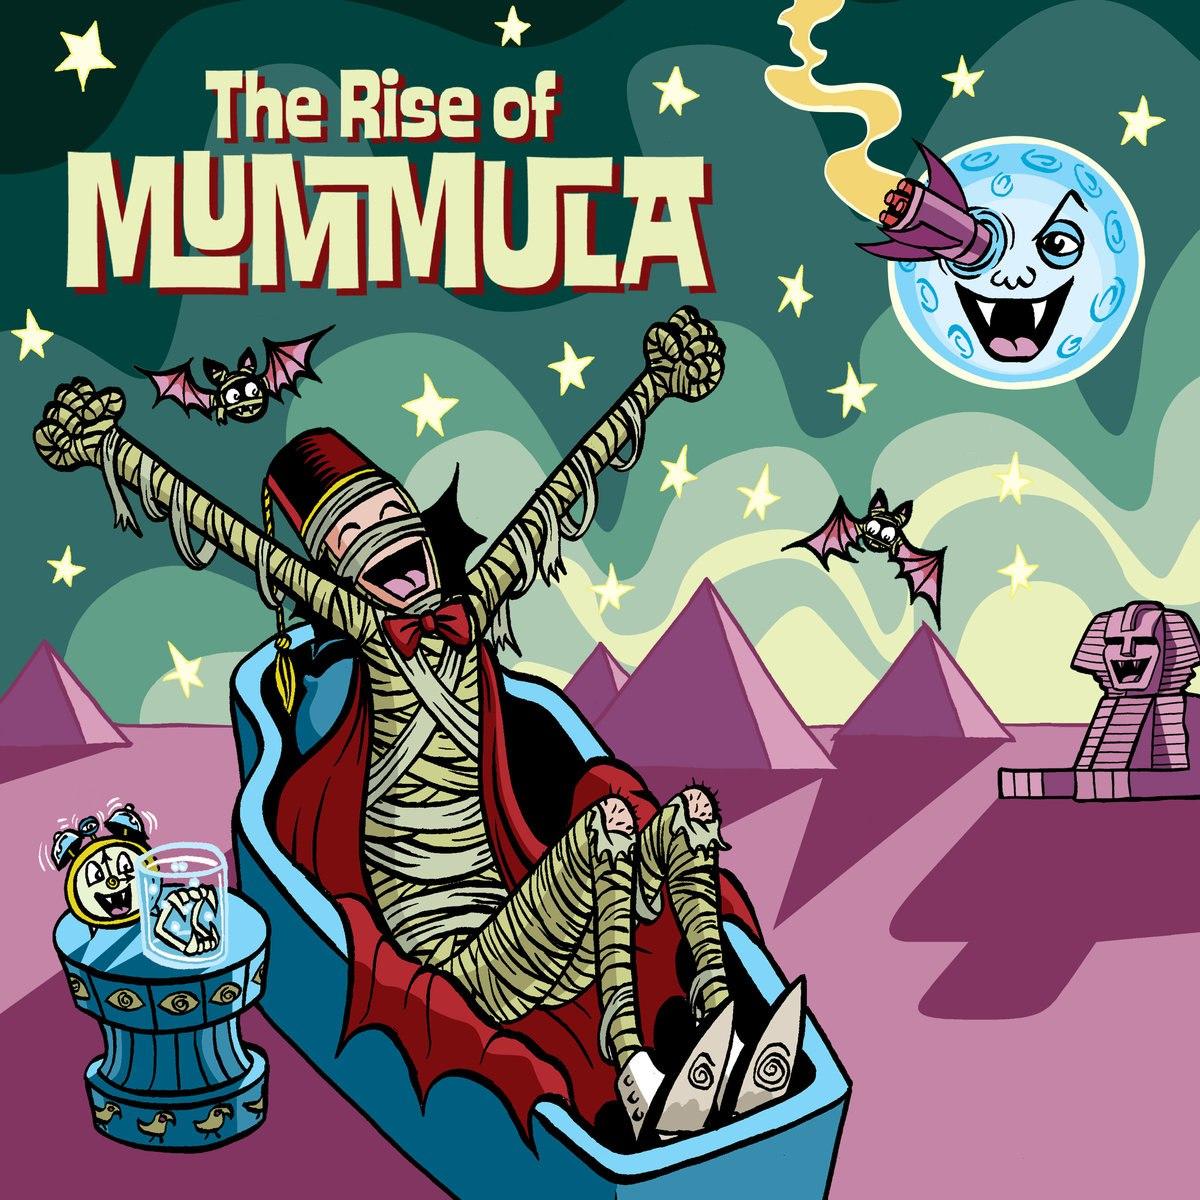 Mummula